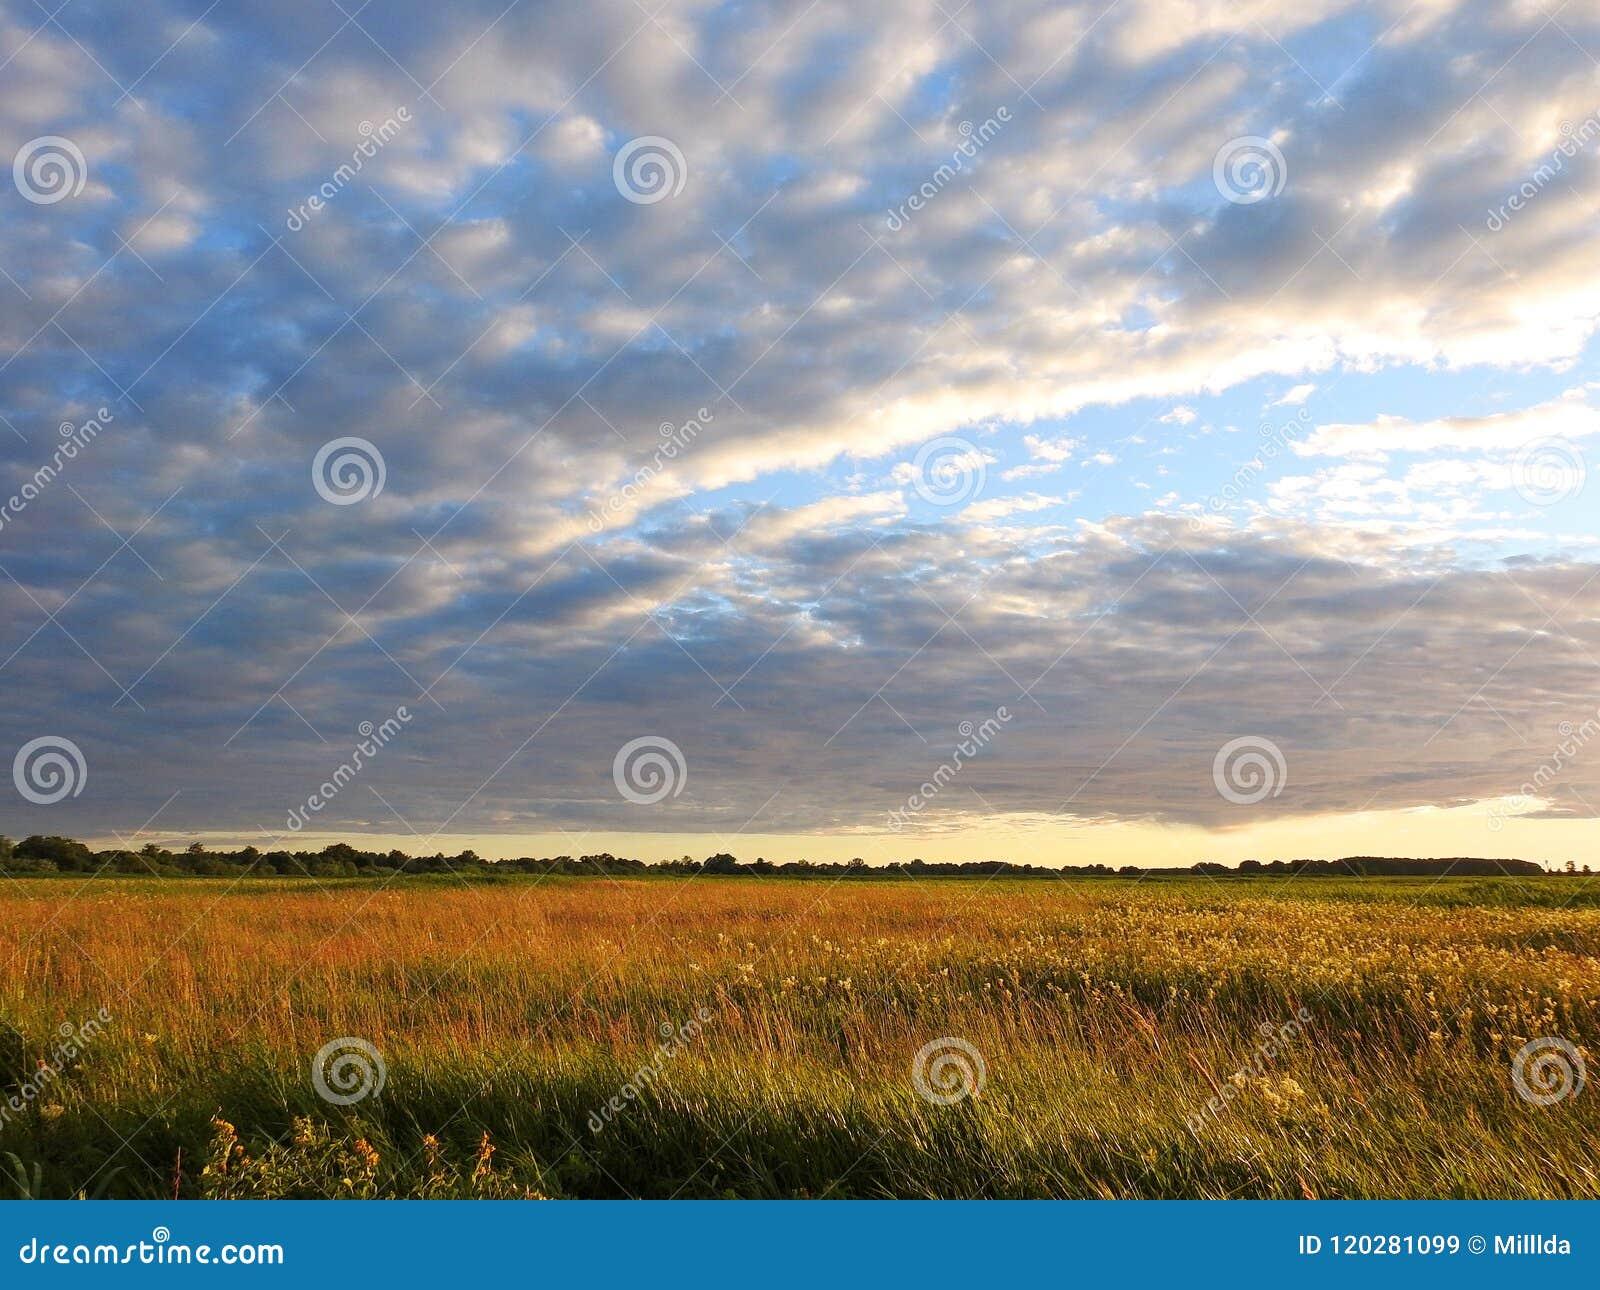 Field and beautiful cloudy sky, Lithuania